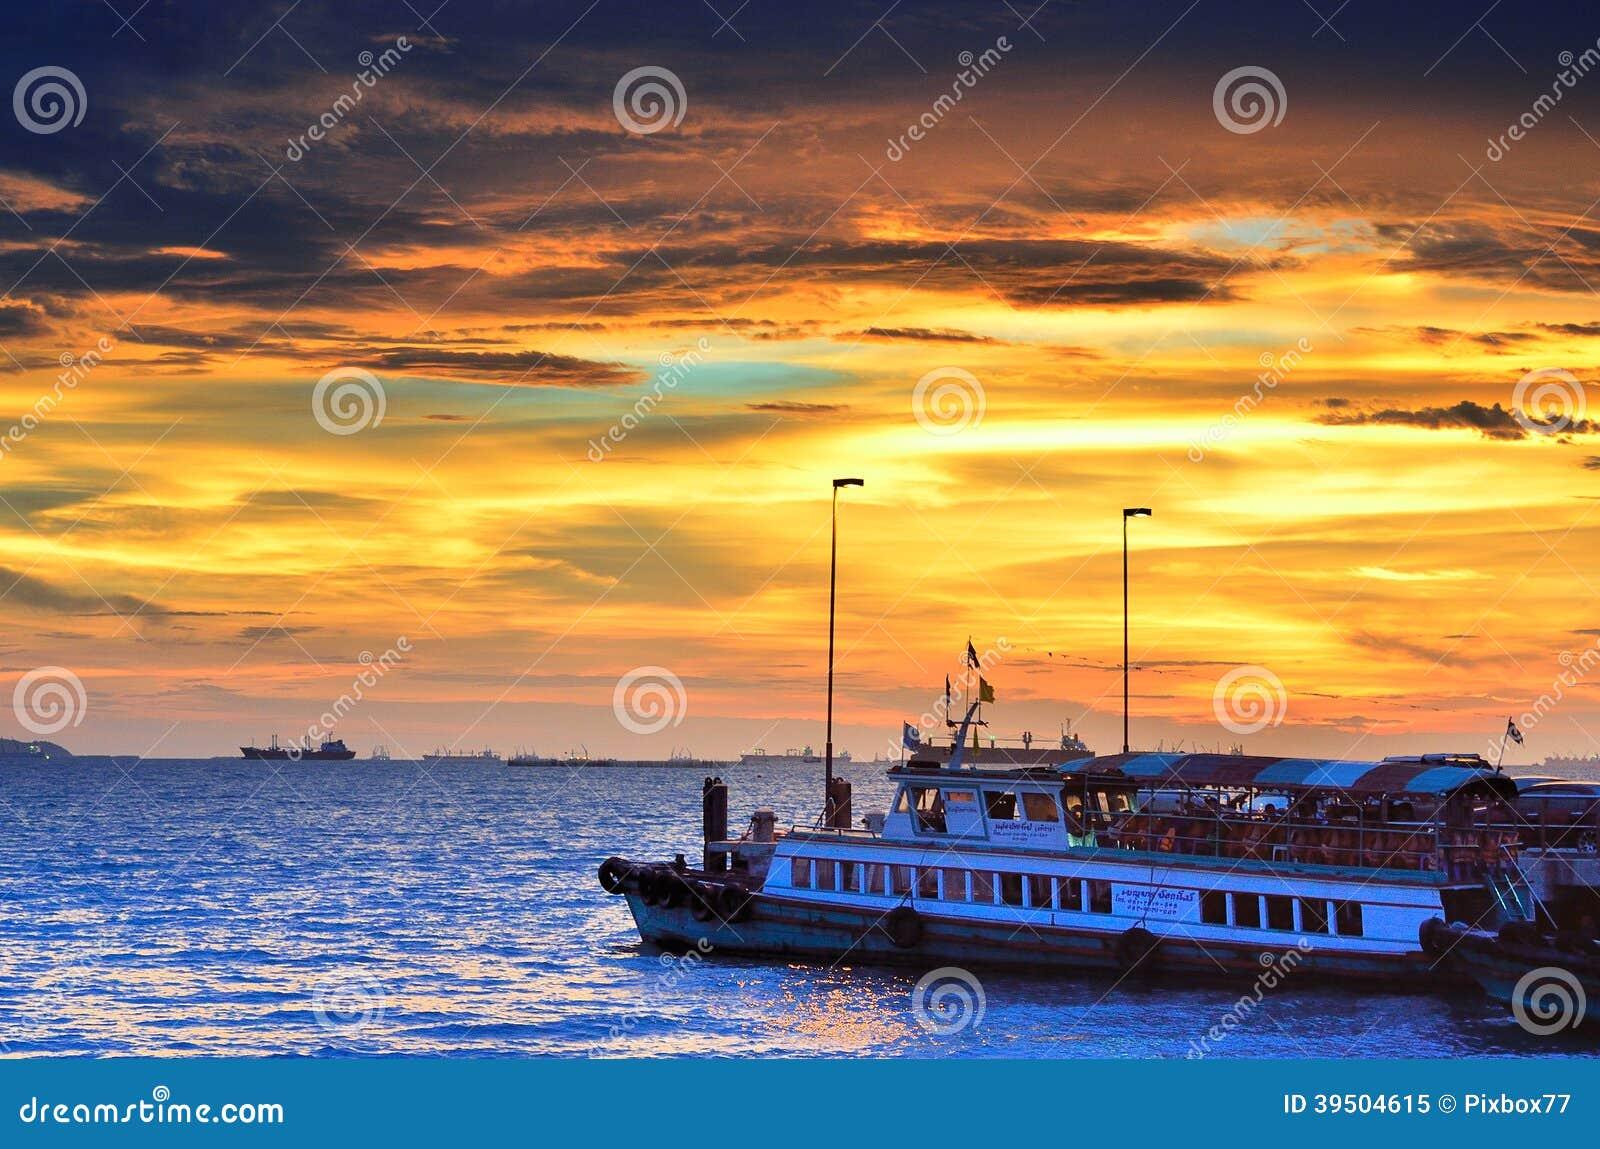 Travel boat waiting for traveler at Sriracha, Chonburi, Thailand